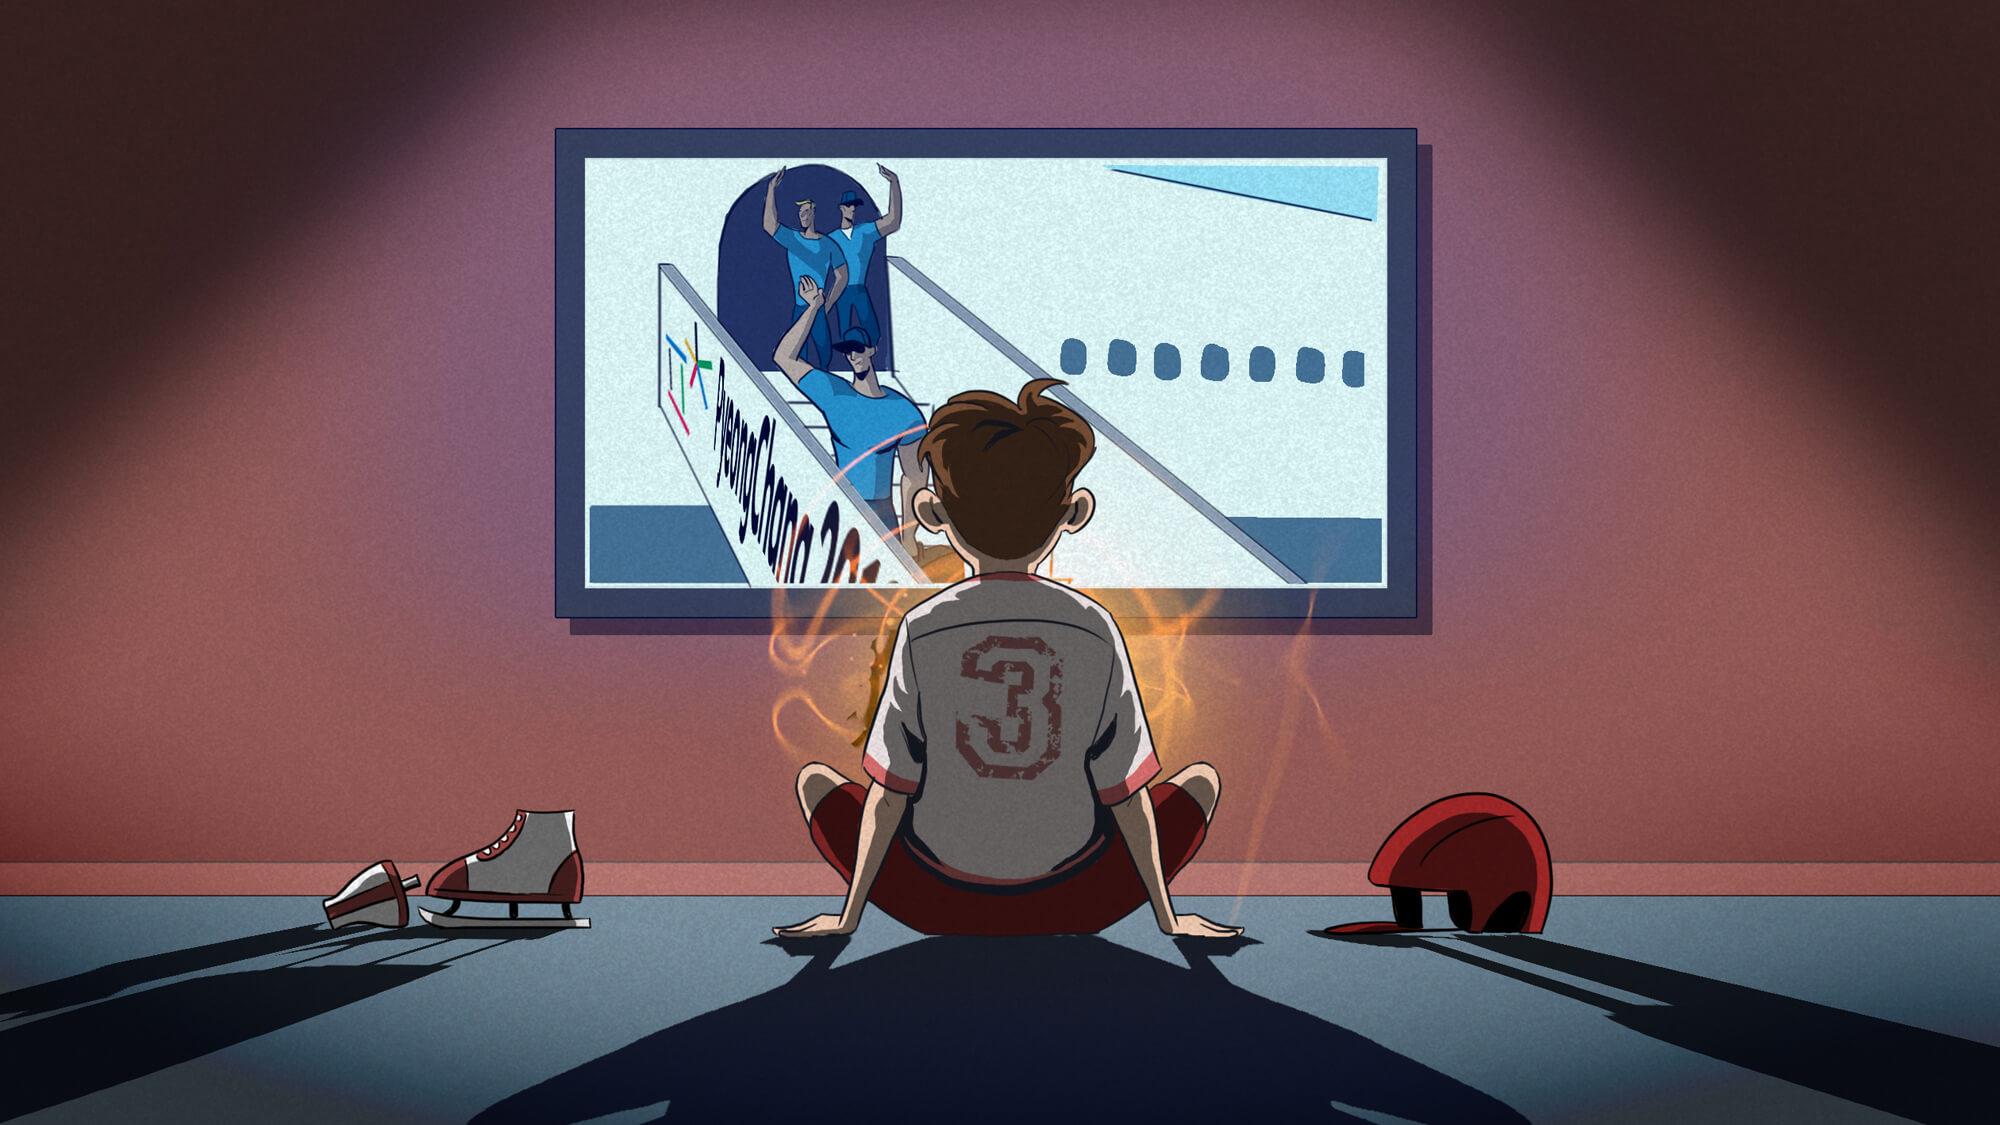 IOC_Storyboard_1.jpg